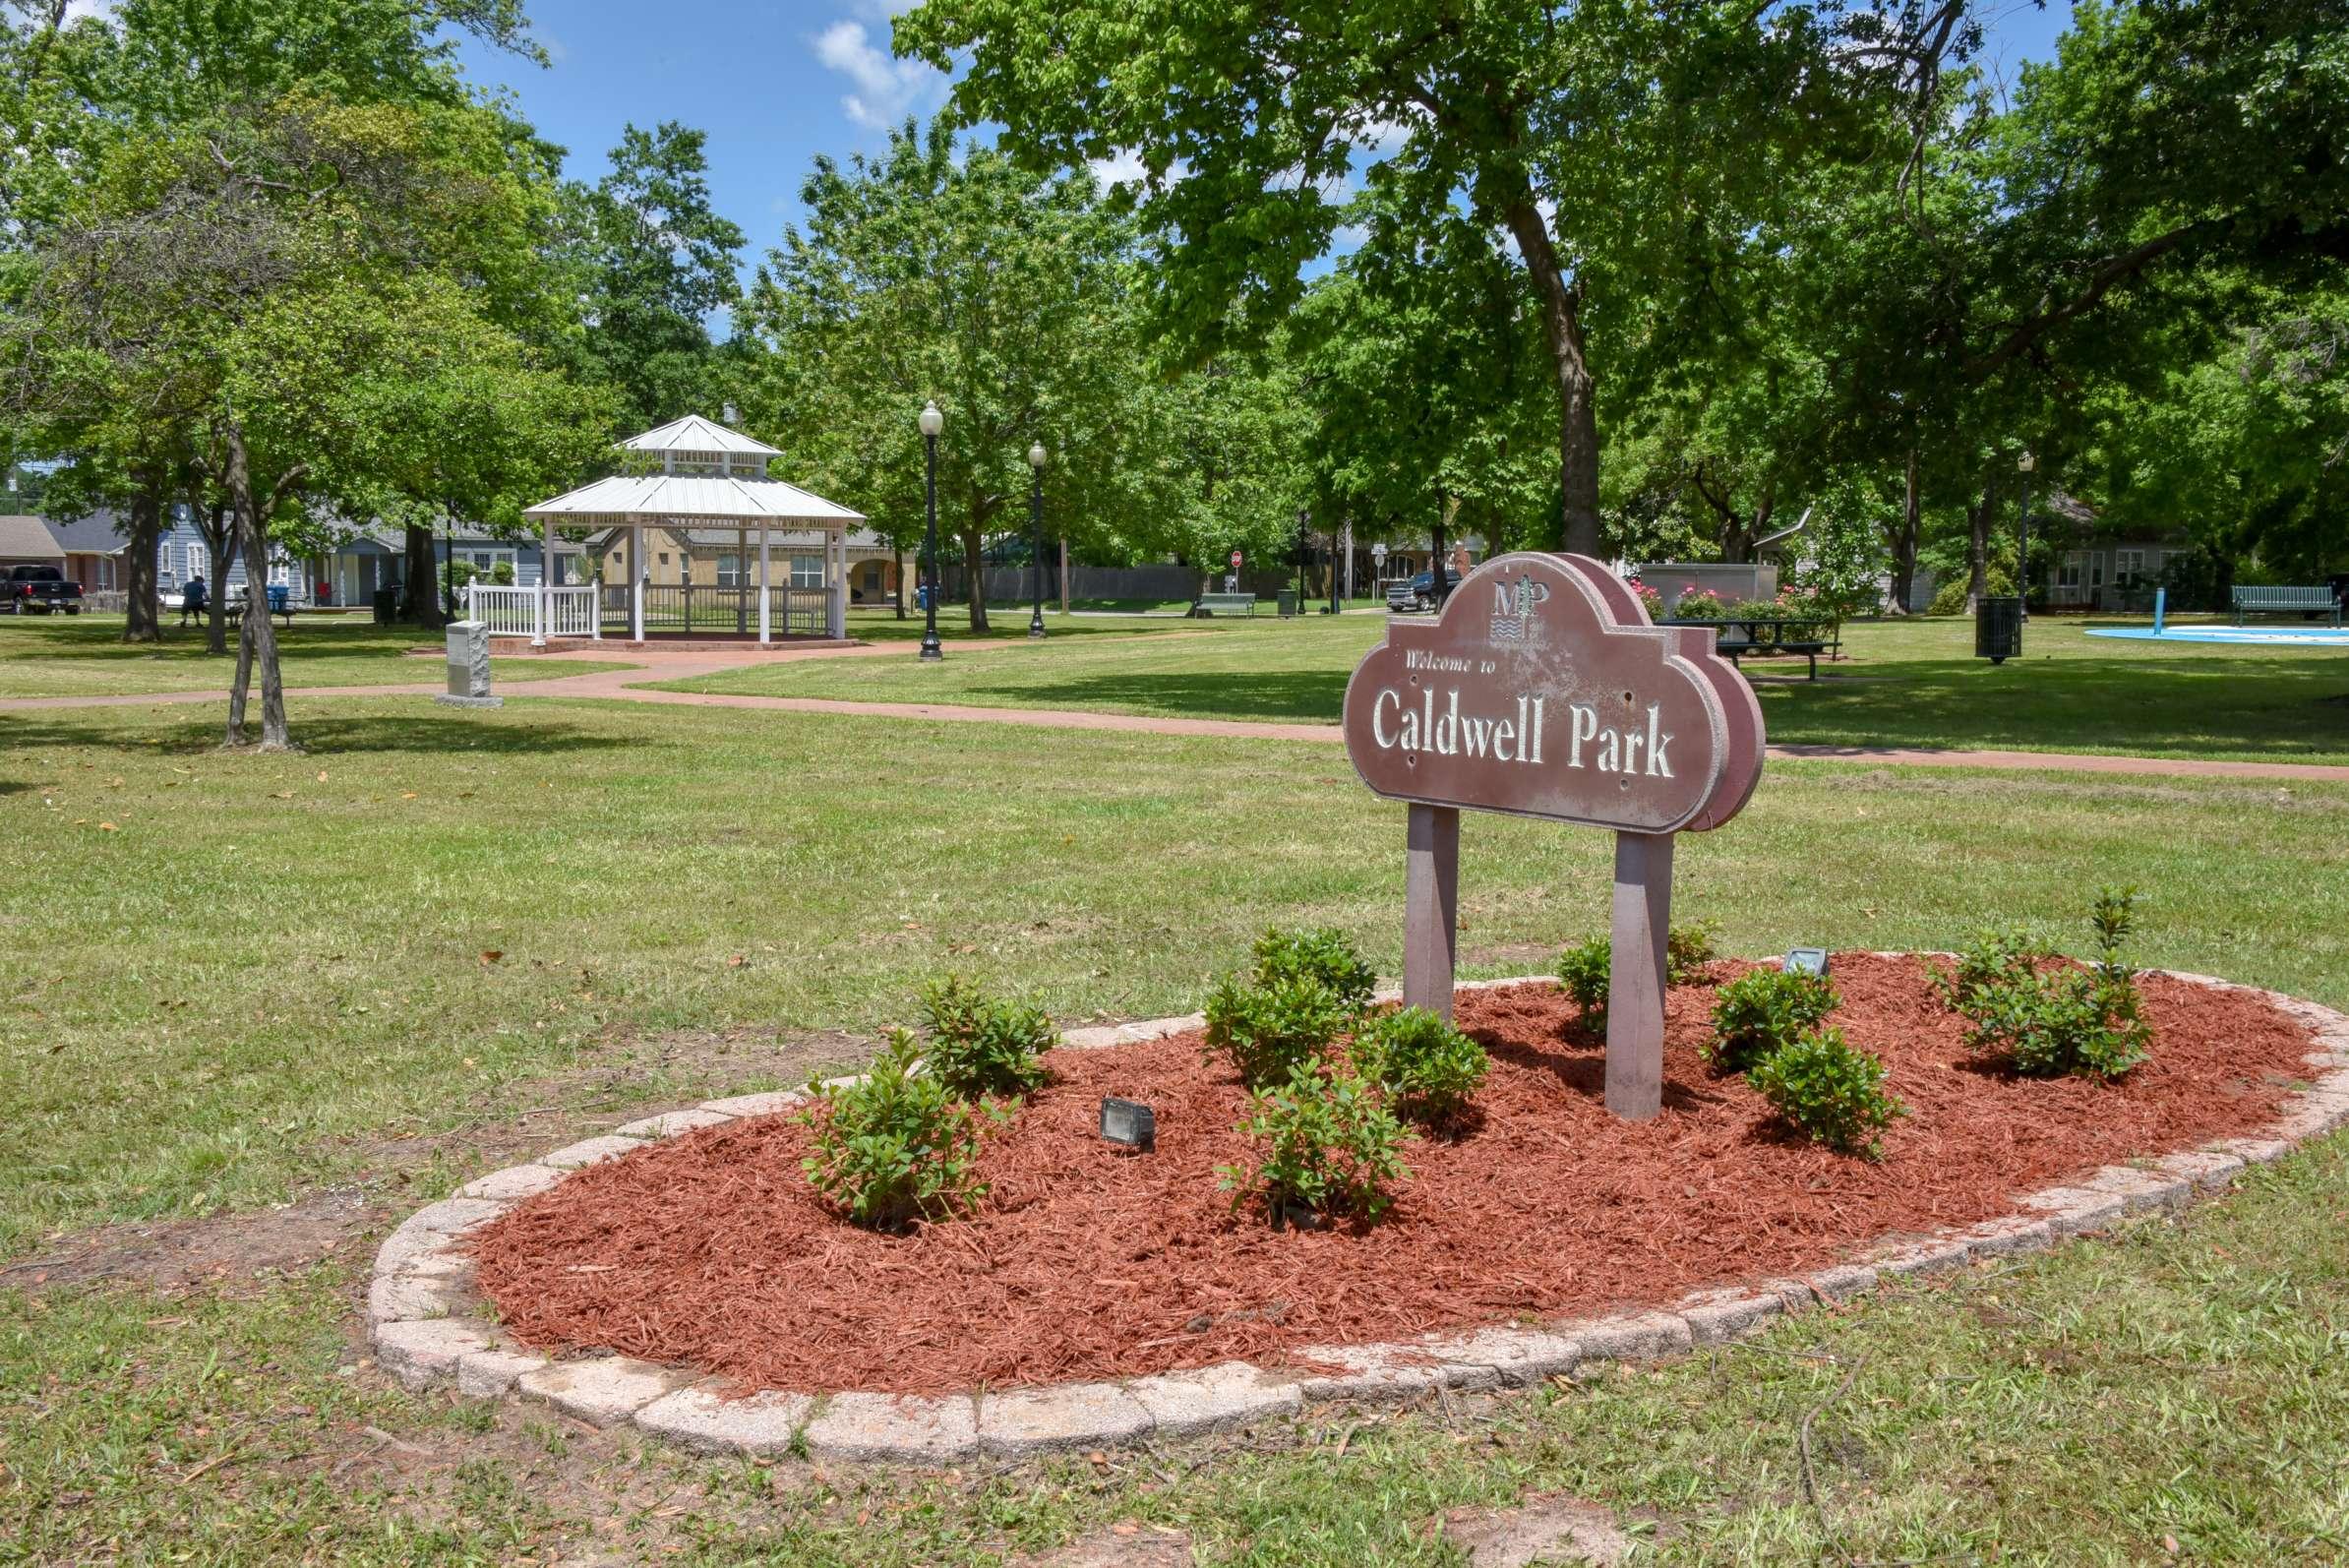 Caldwell Park sign Mount Pleasant texas